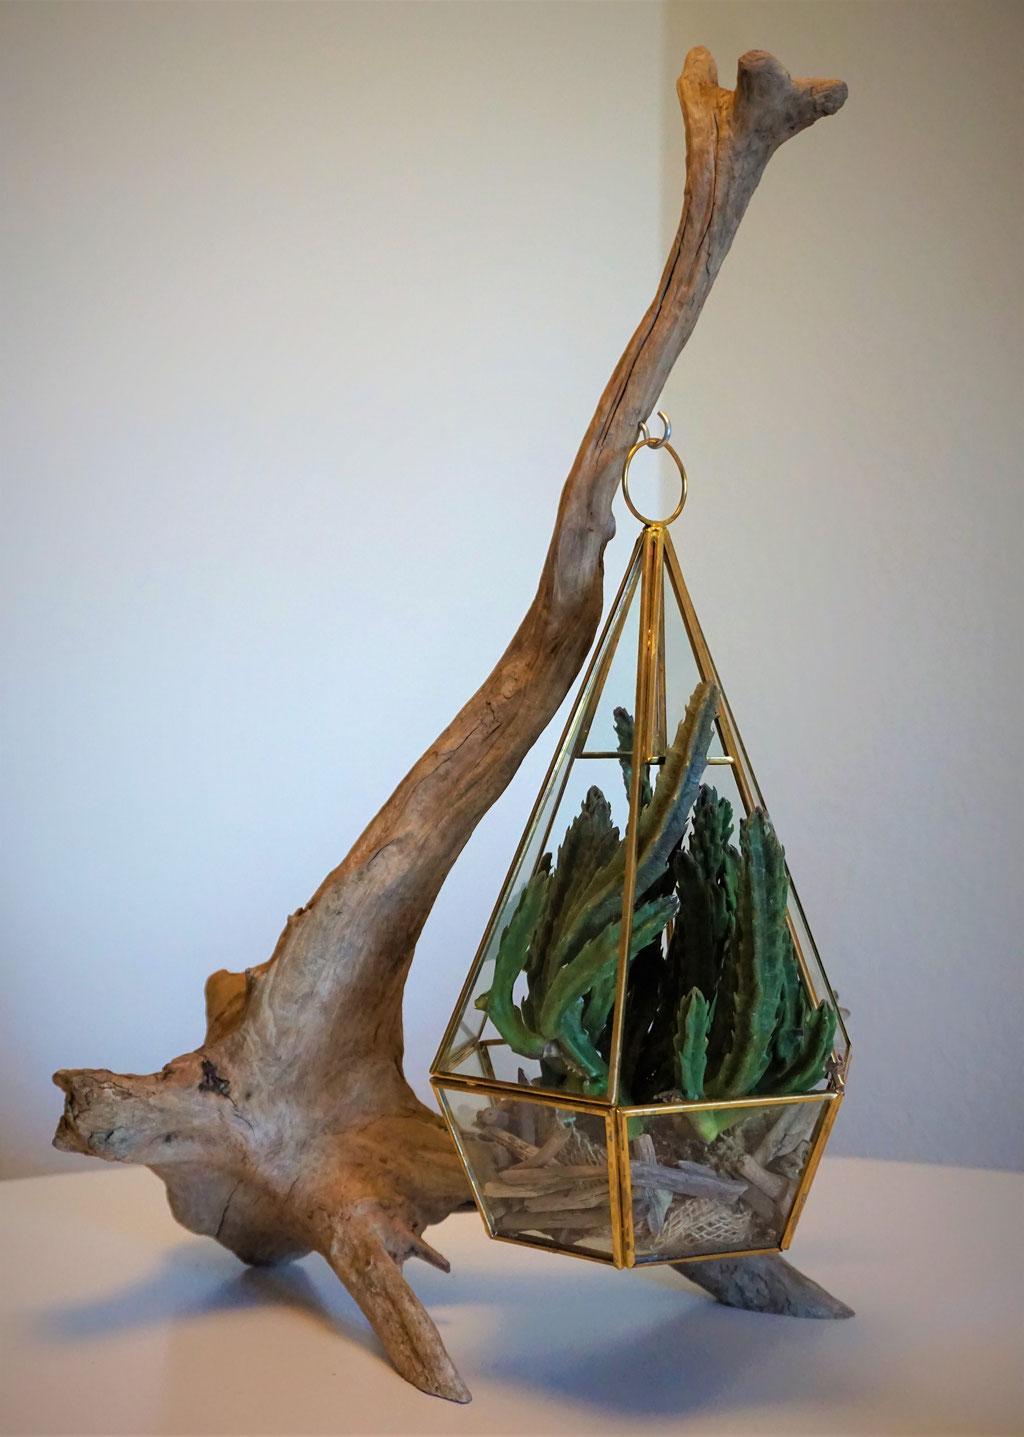 Pflanzenampel Preis: 45€